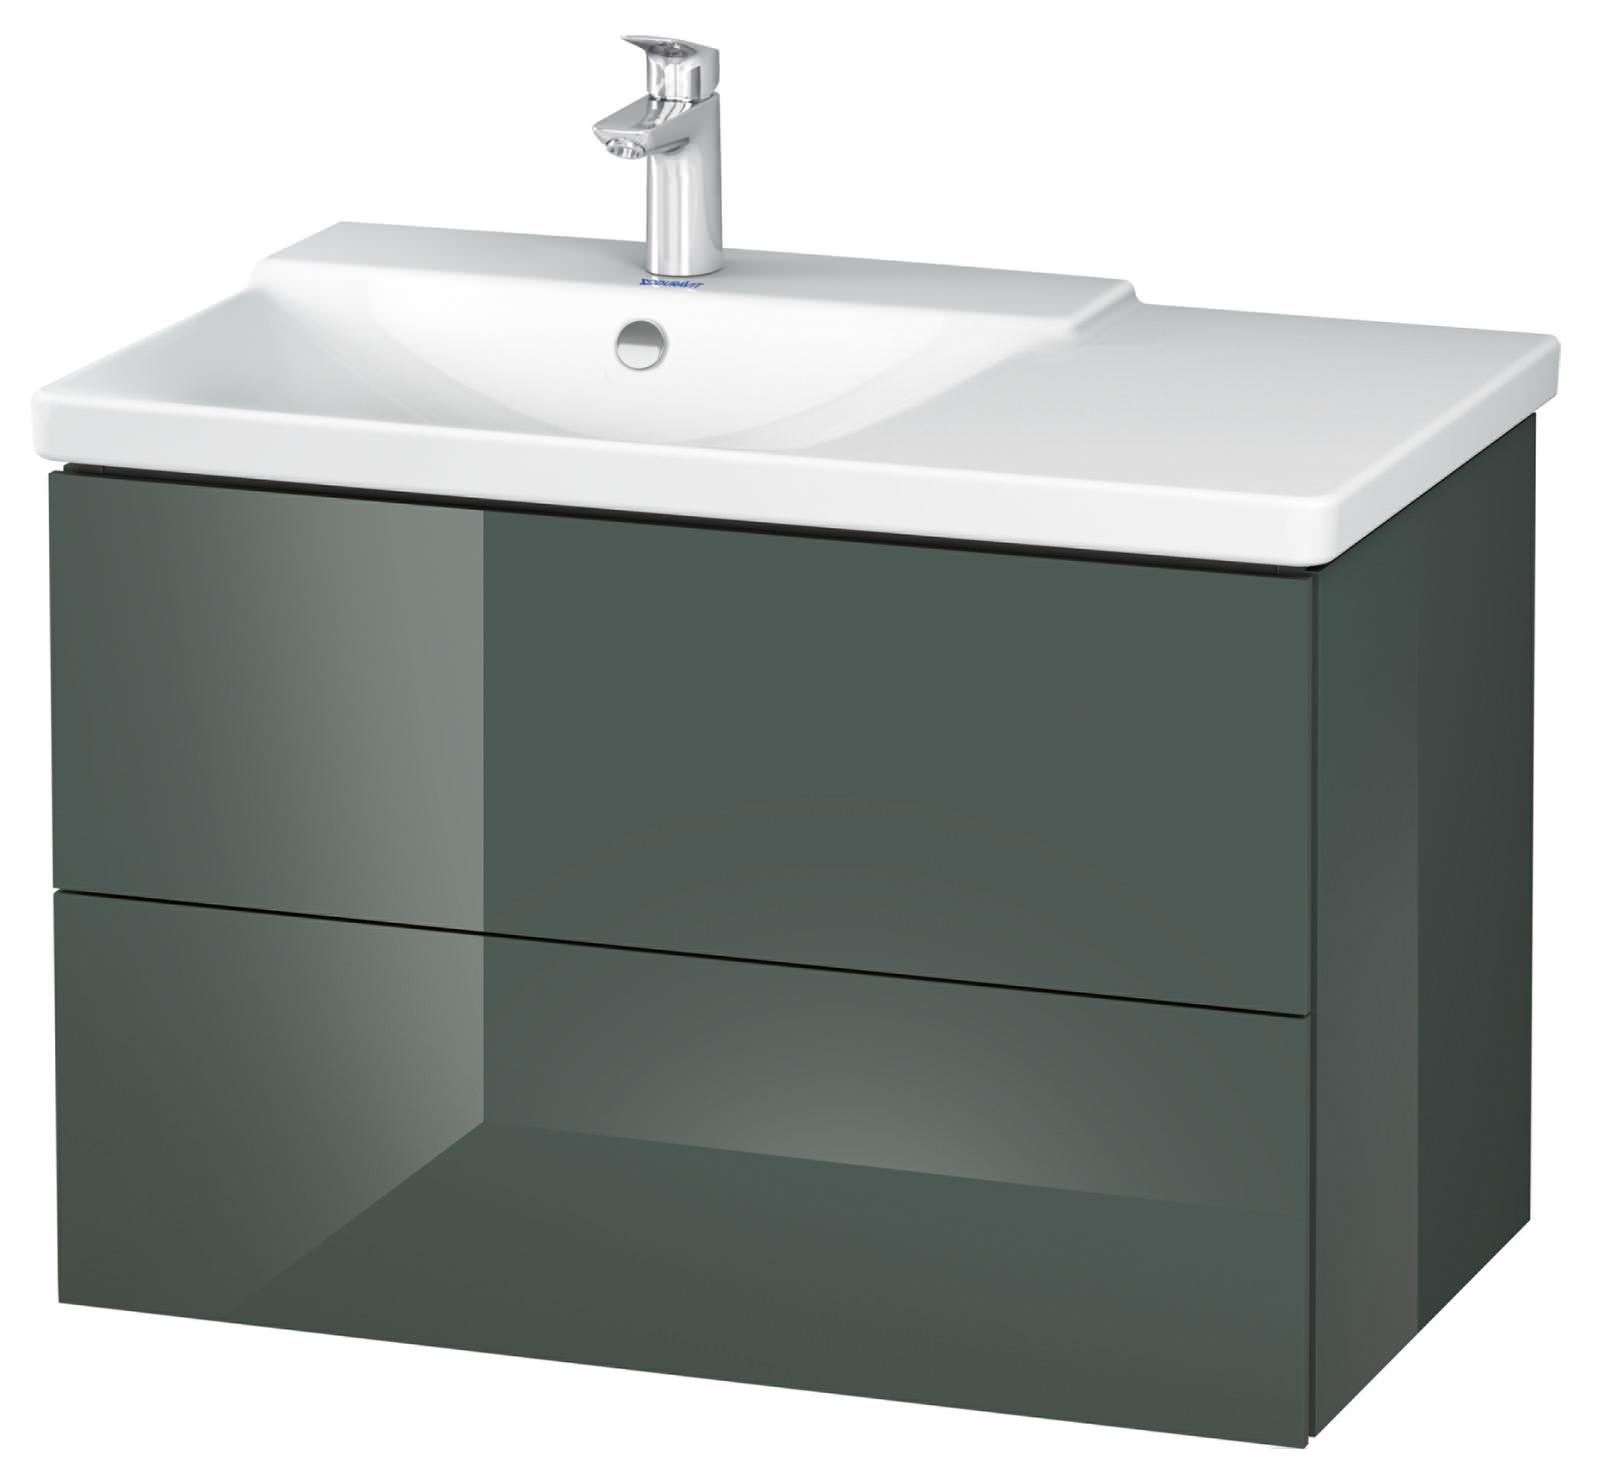 duravit l cube 820mm vanity unit with p3 comforts basin bowl on left. Black Bedroom Furniture Sets. Home Design Ideas